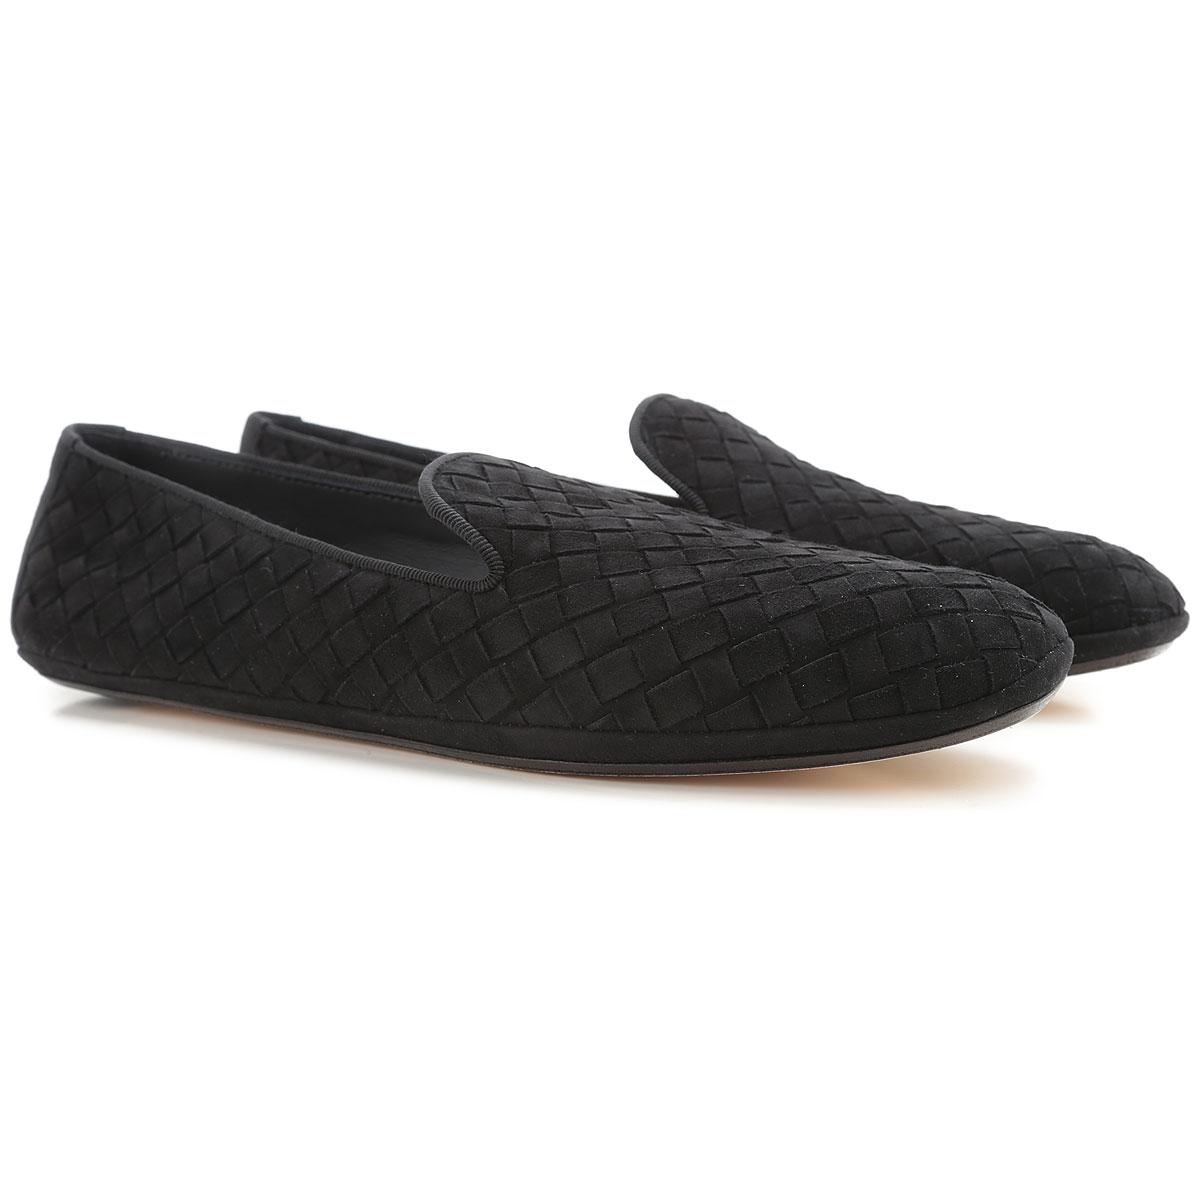 Image of Bottega Veneta Slip on Sneakers for Women On Sale, Black, Suede leather, 2017, 10.5 7 7.5 8